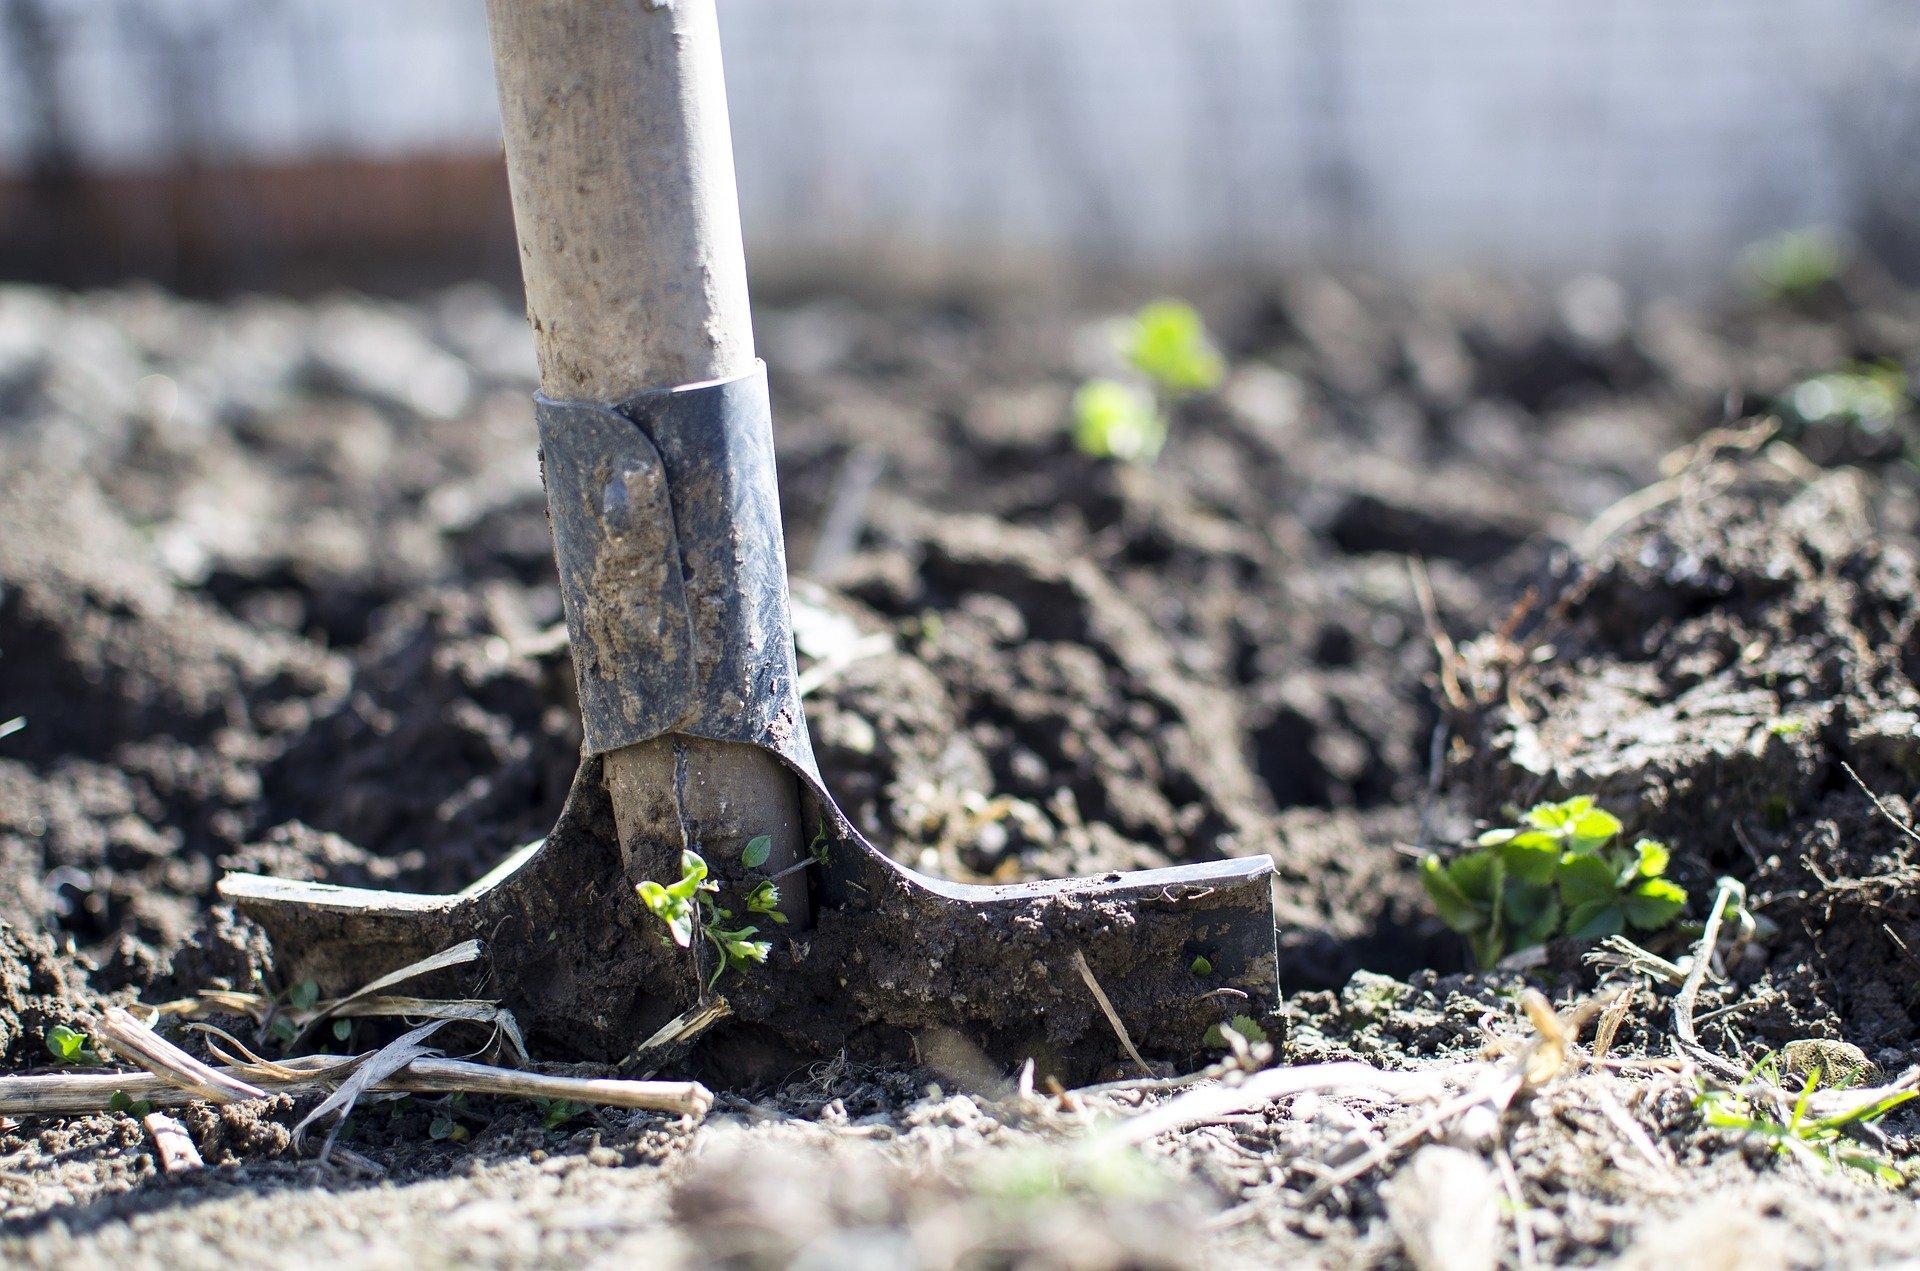 2. Nettoyer et enrichir la terre